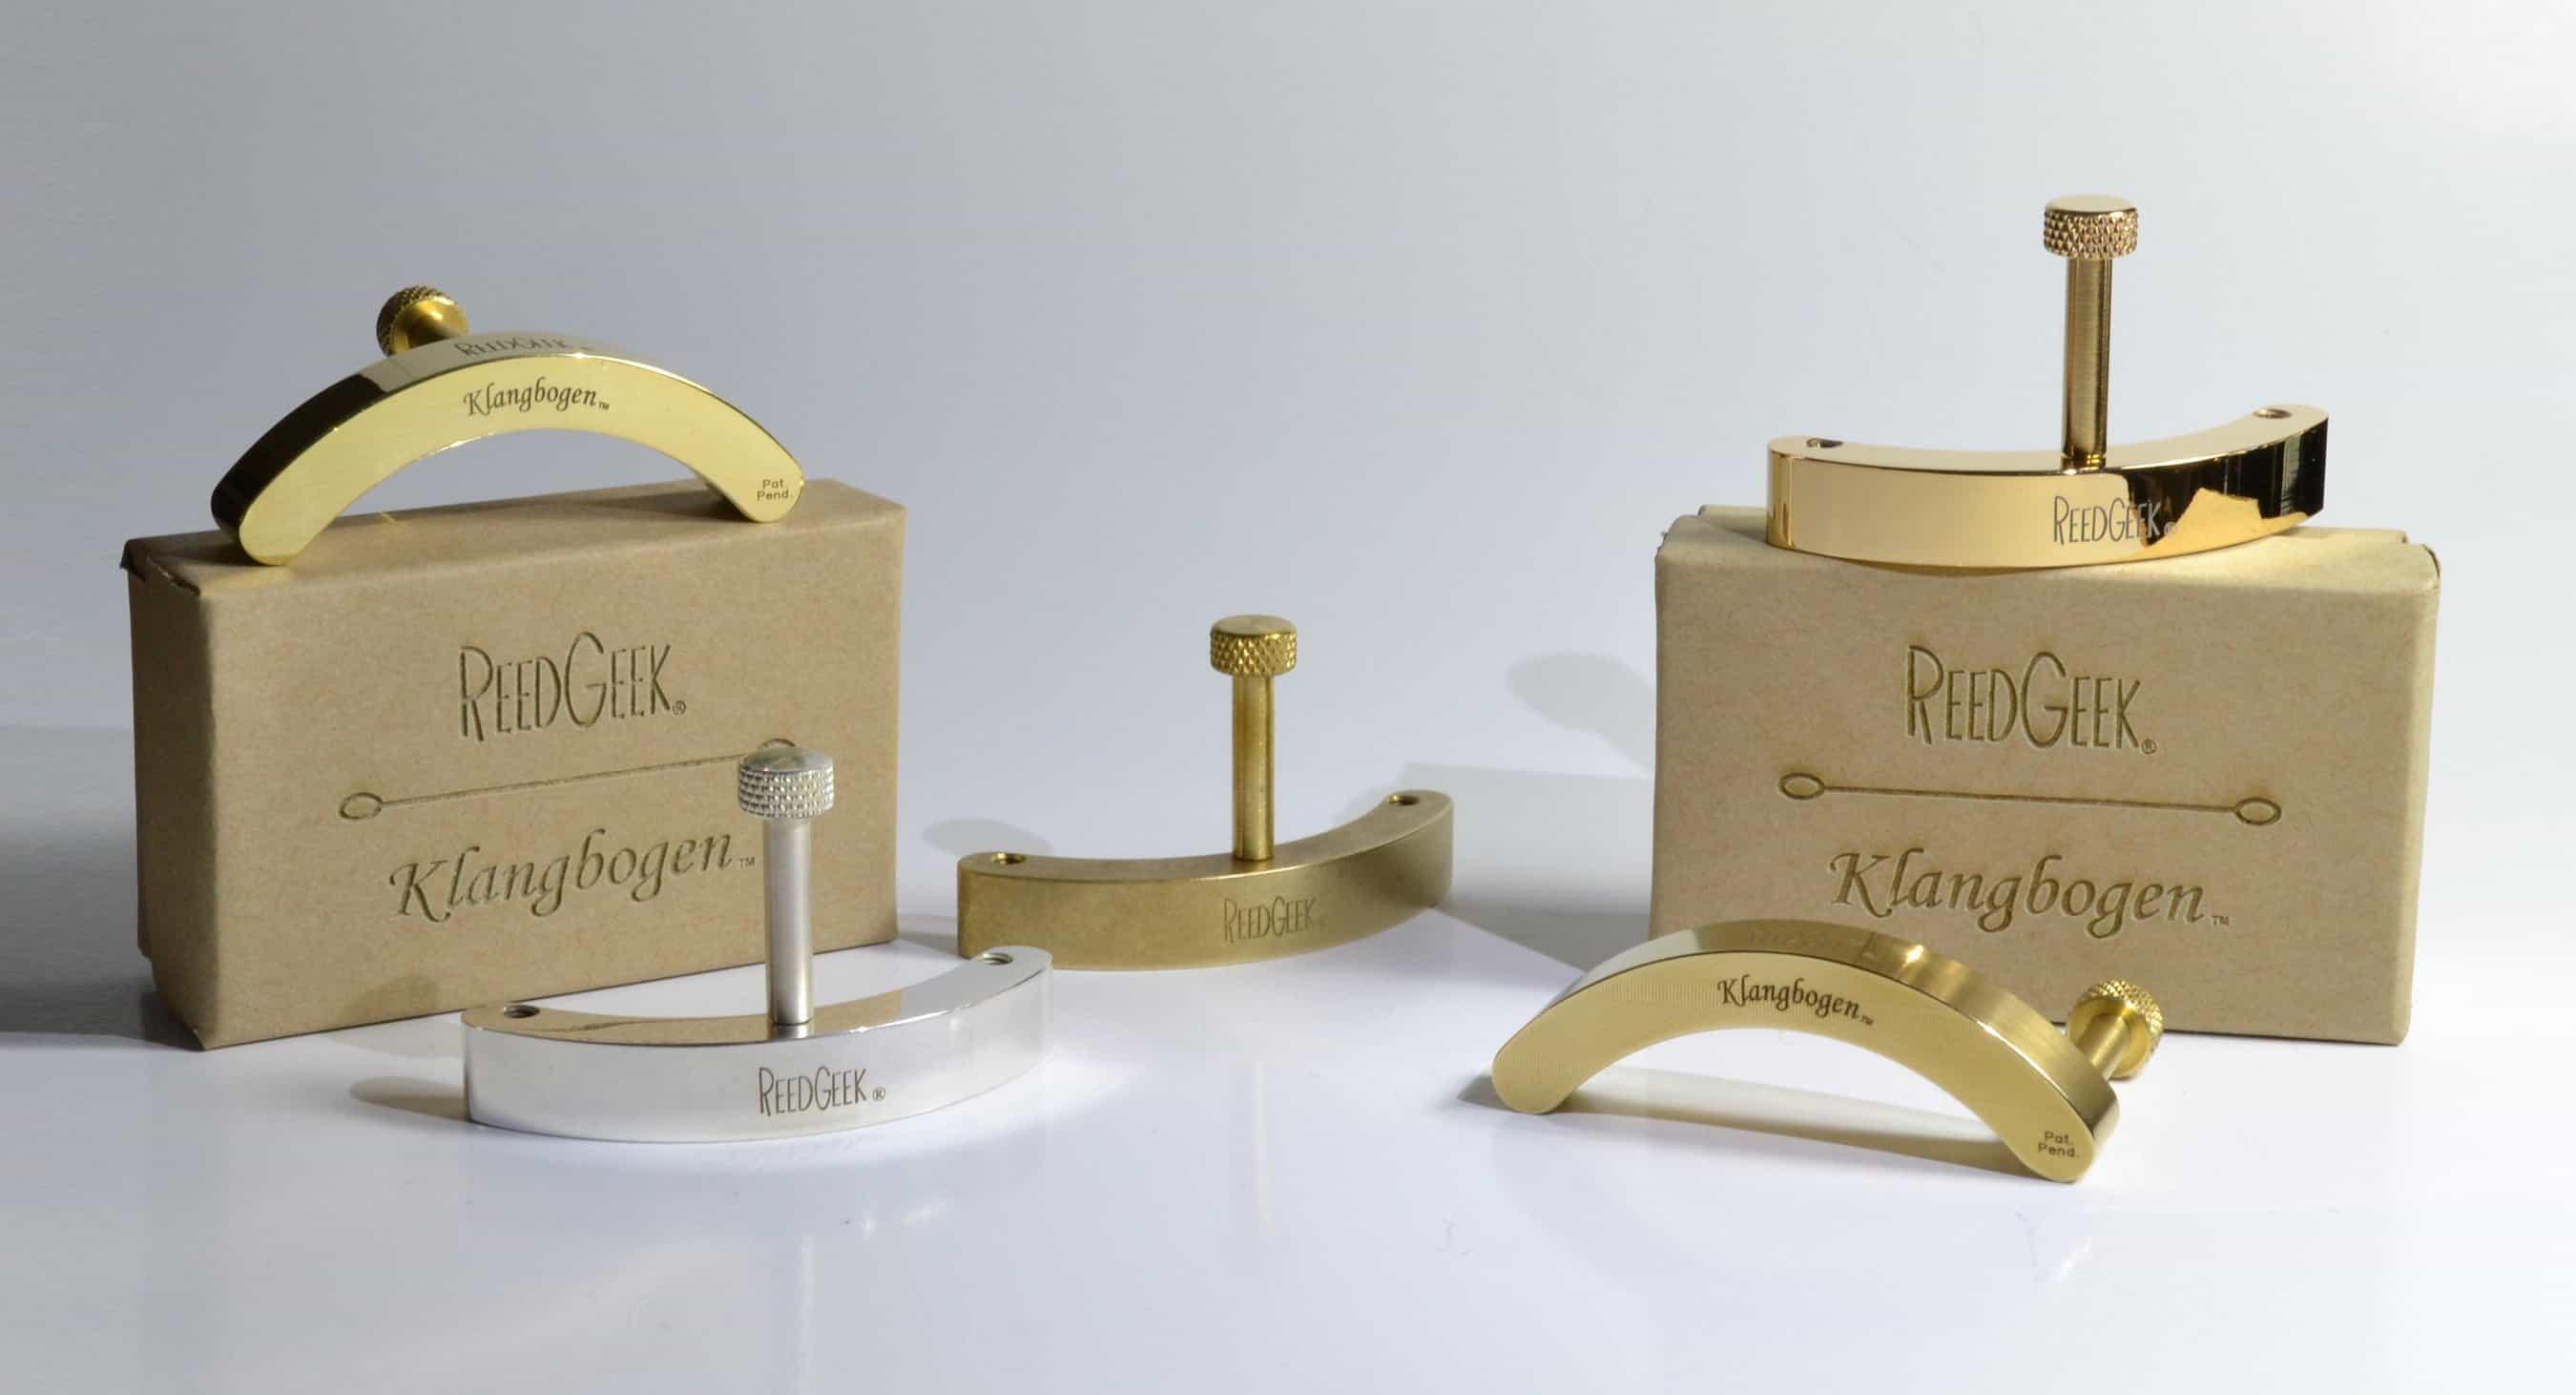 Klangbogen; a new tool from ReedGeek to improve your saxophone tone